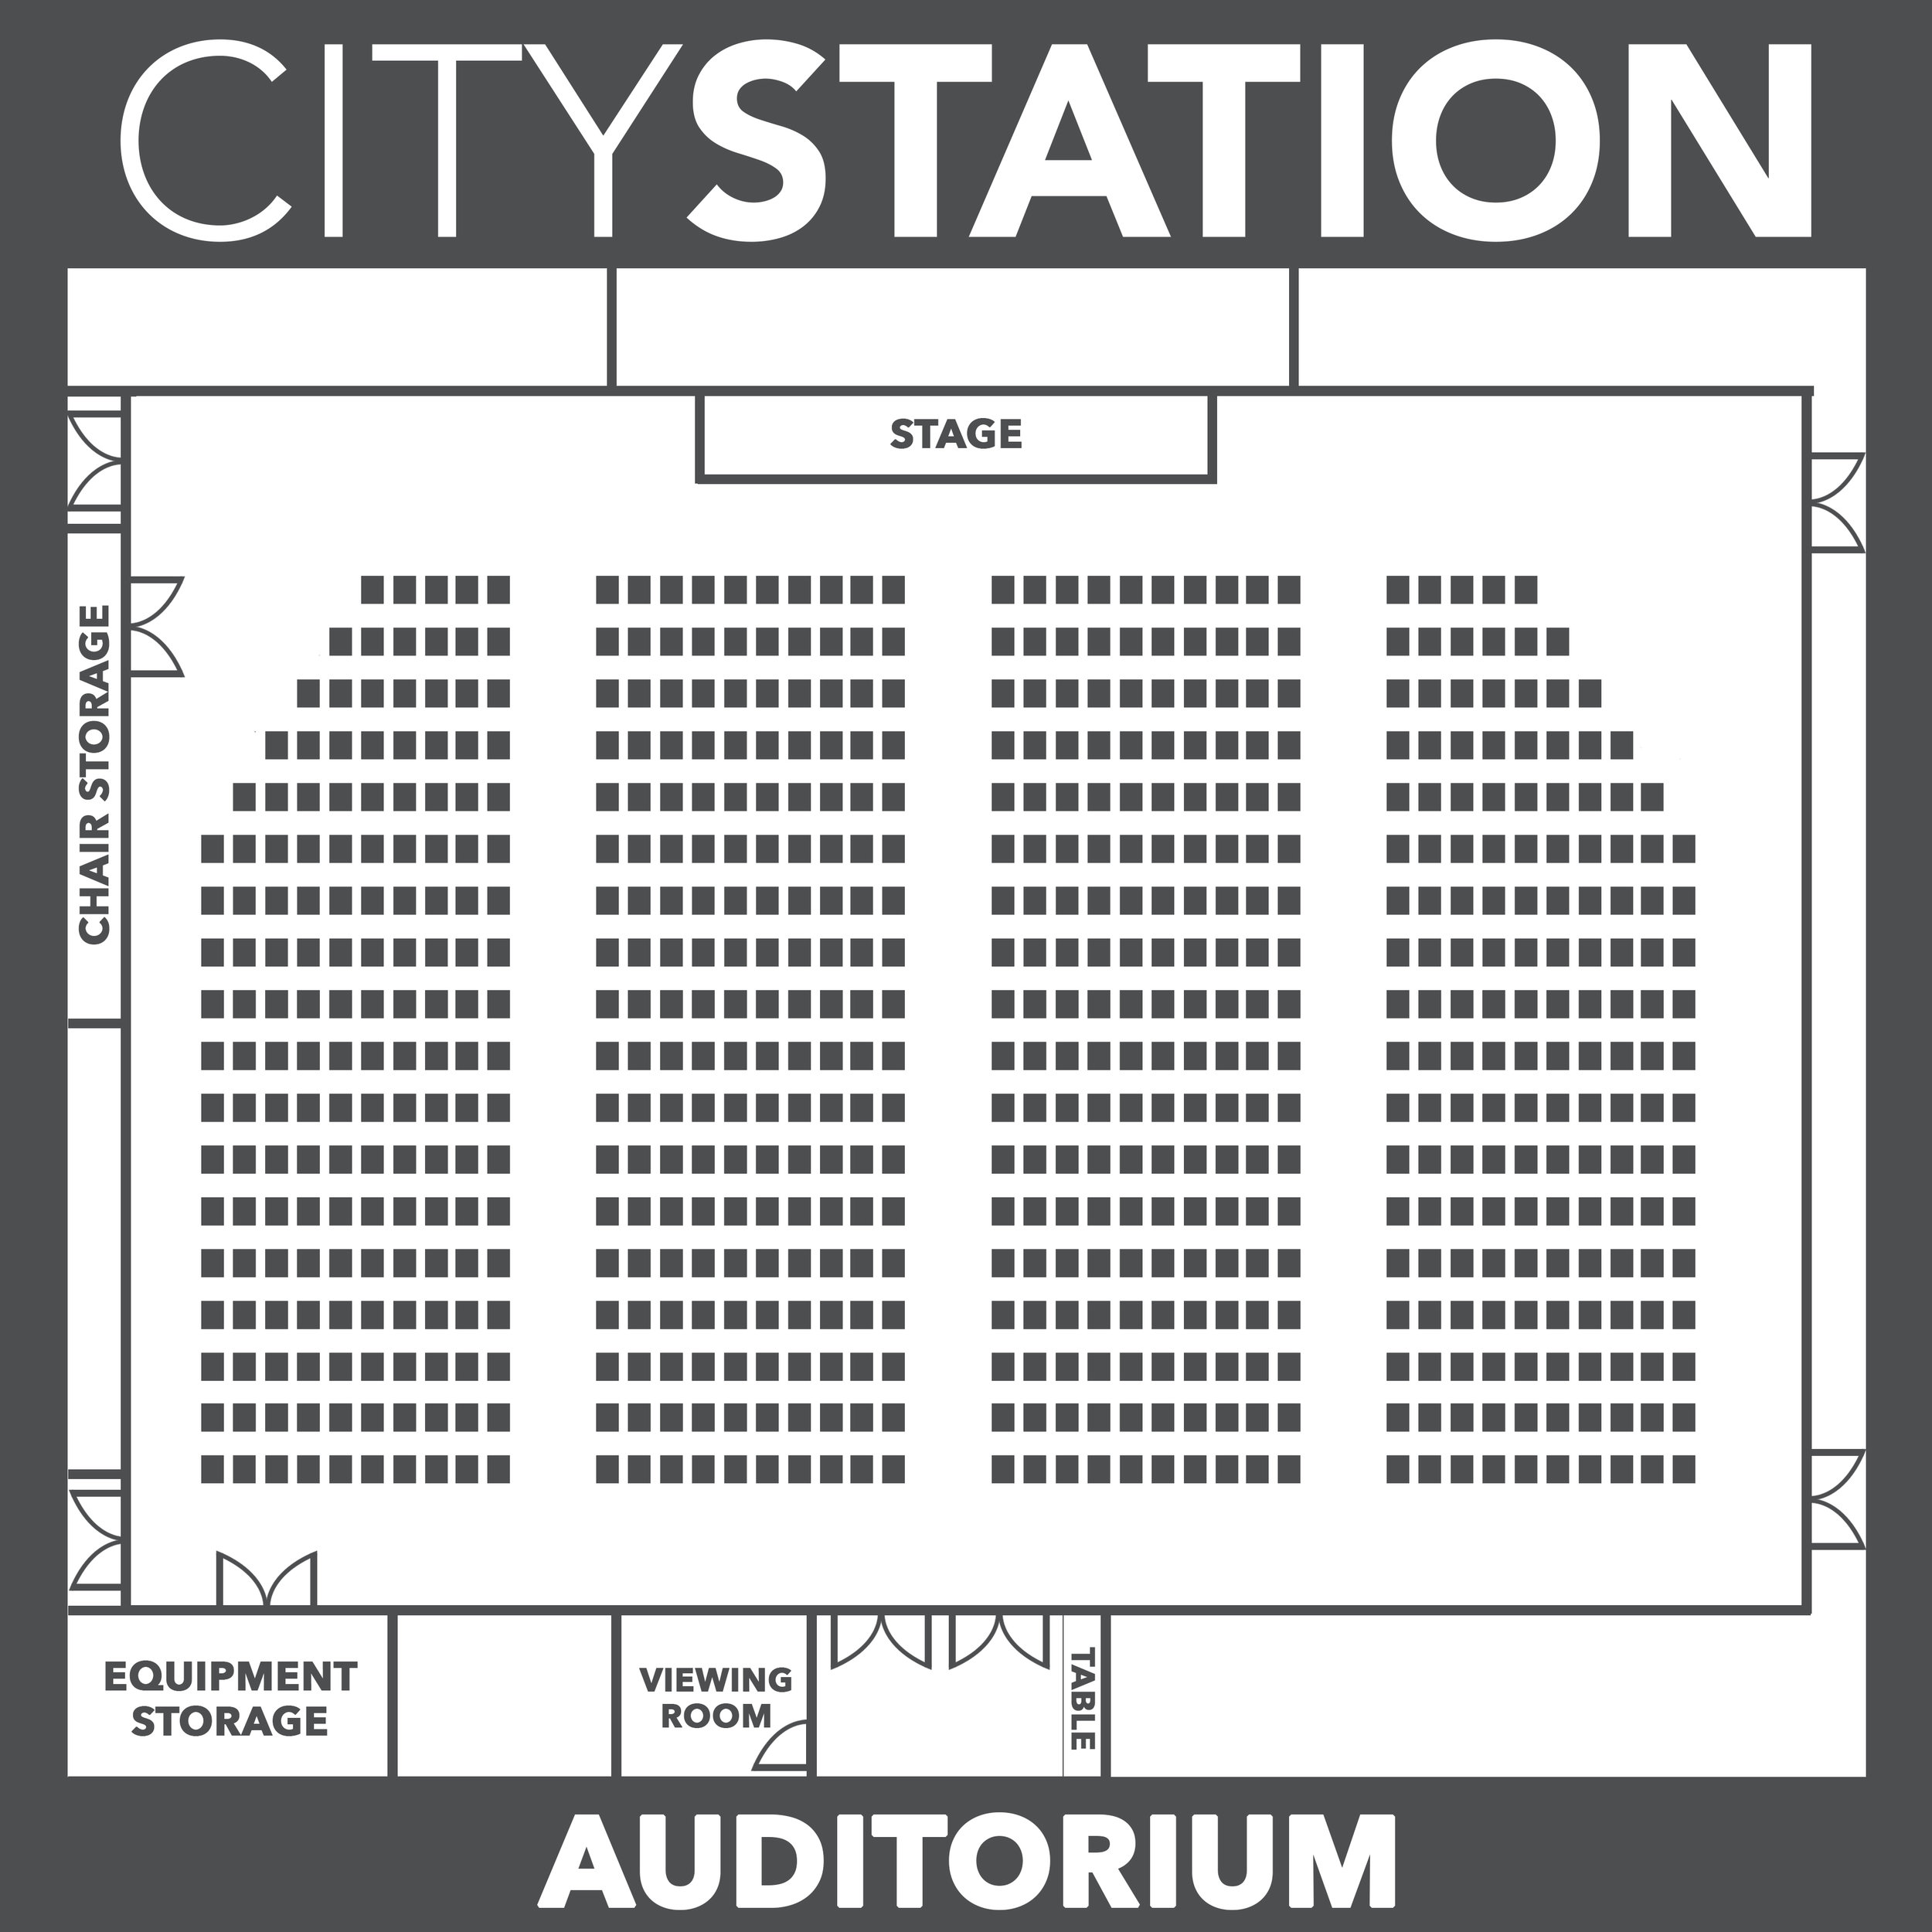 auditorium_chairs.jpg